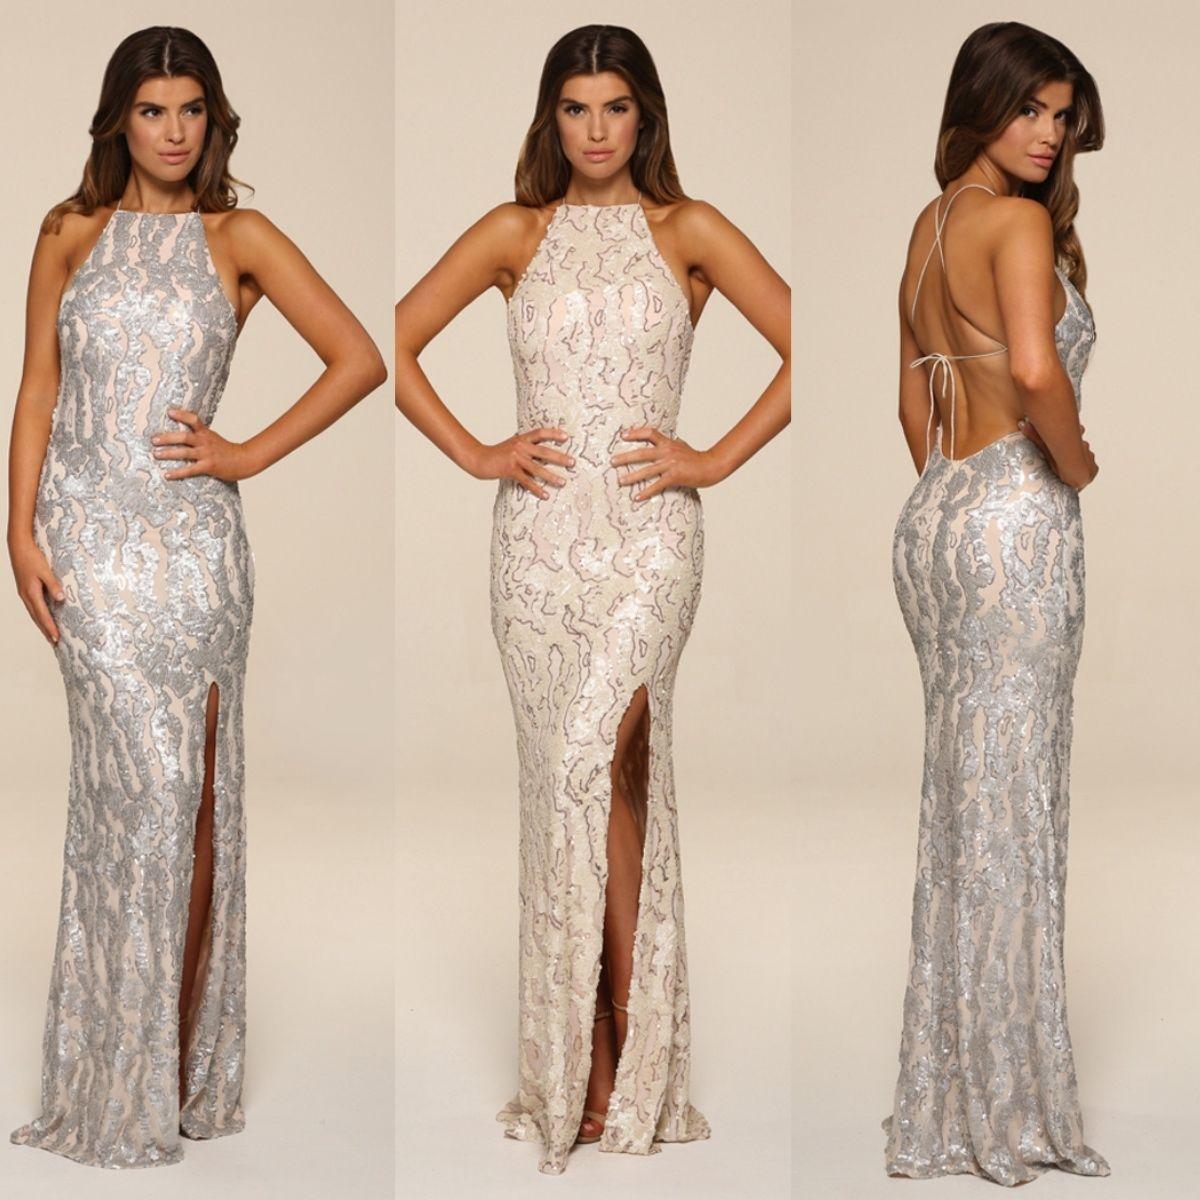 Honor Gold Harley Sequin Maxi Evening Dress Backless Design Long ... d657300e0